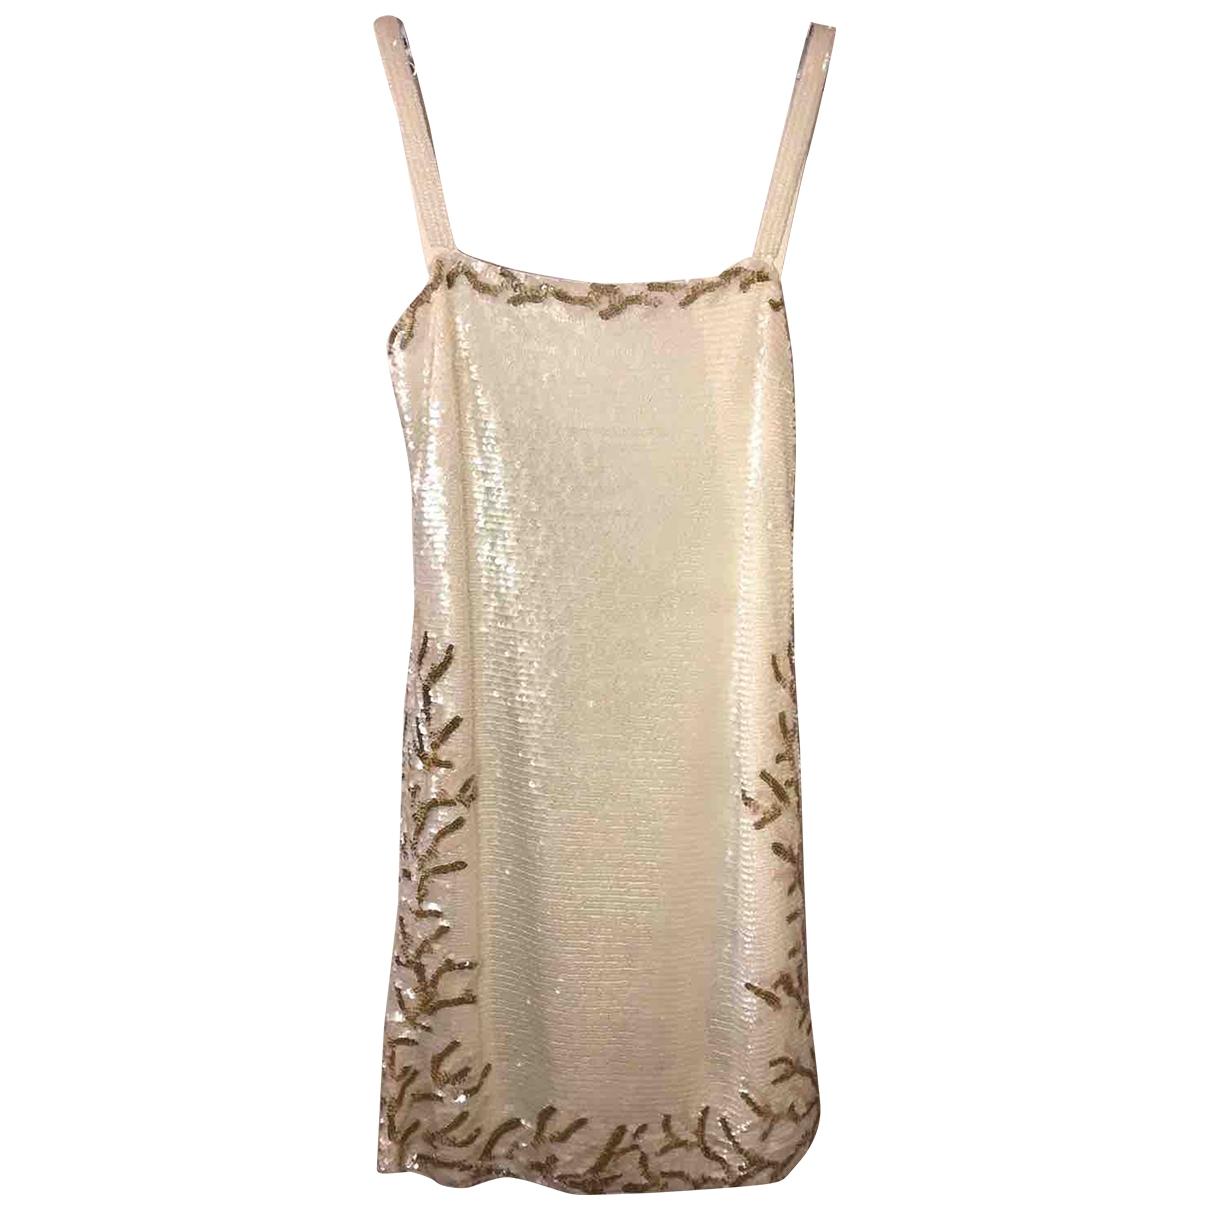 Valentino Garavani \N Glitter dress for Women 40 IT